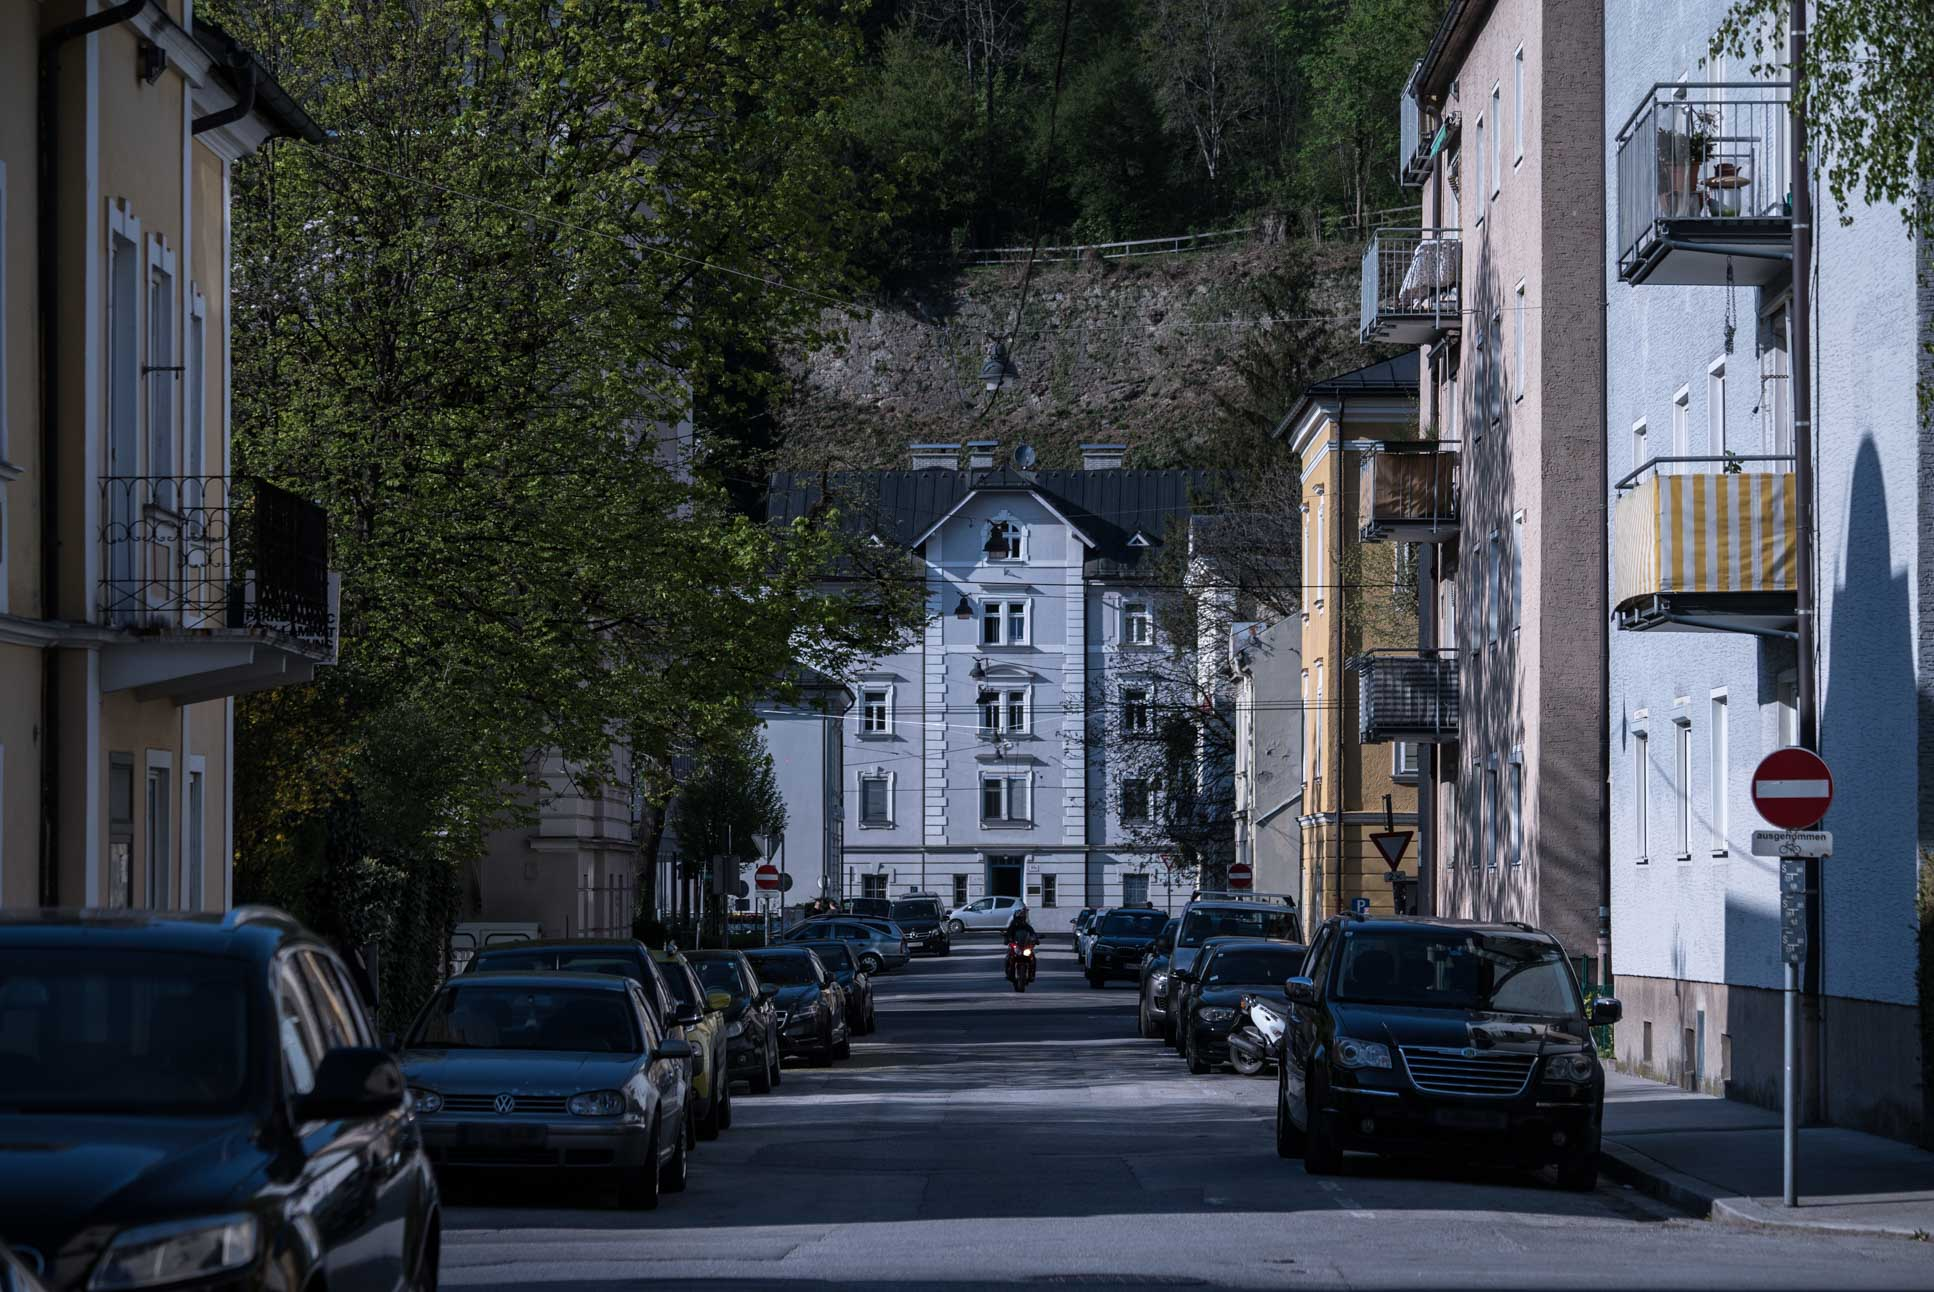 Photo by Pascal Sommer - Untersbergstraße, Salzburg